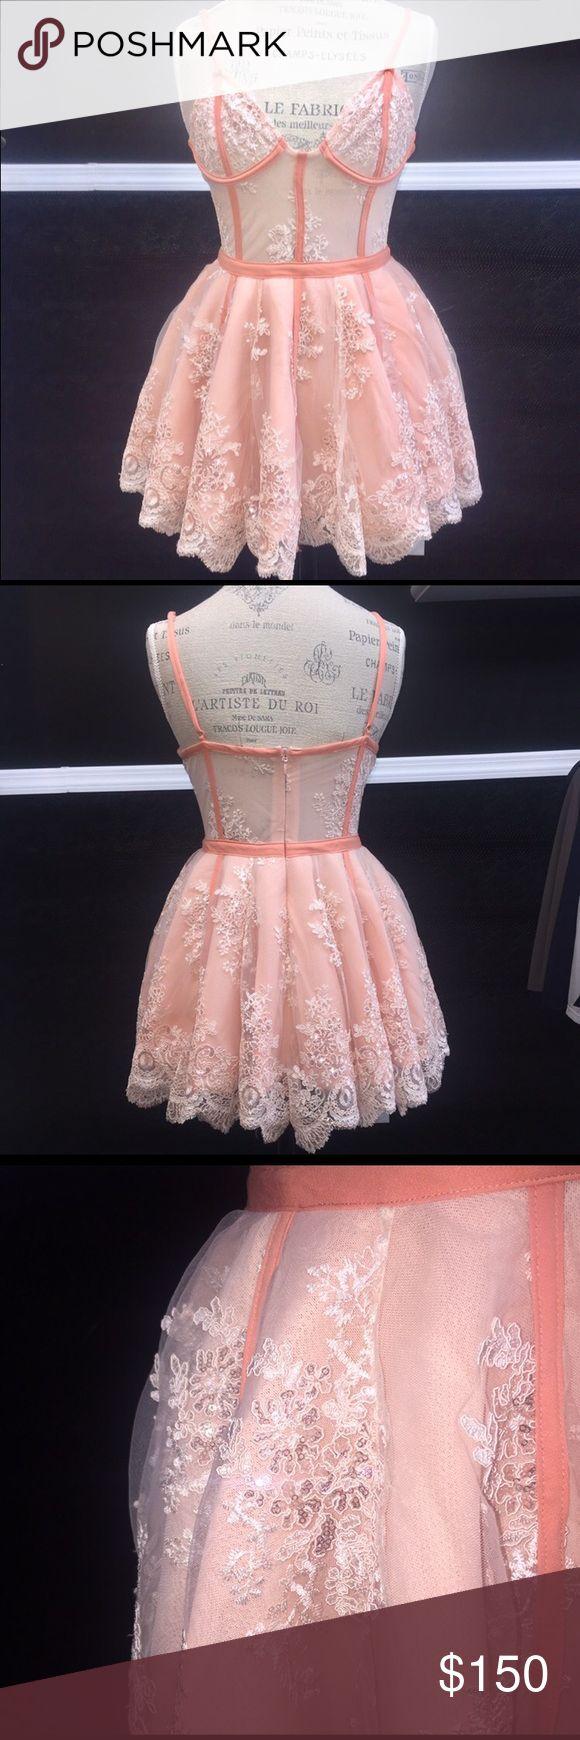 House of CB Ravella Peach Lace Dress - Large Beautiful hand-sewn peach Lace dress with bustier-like bodice. Feminine and flirty. Size large. house of cb Dresses Mini